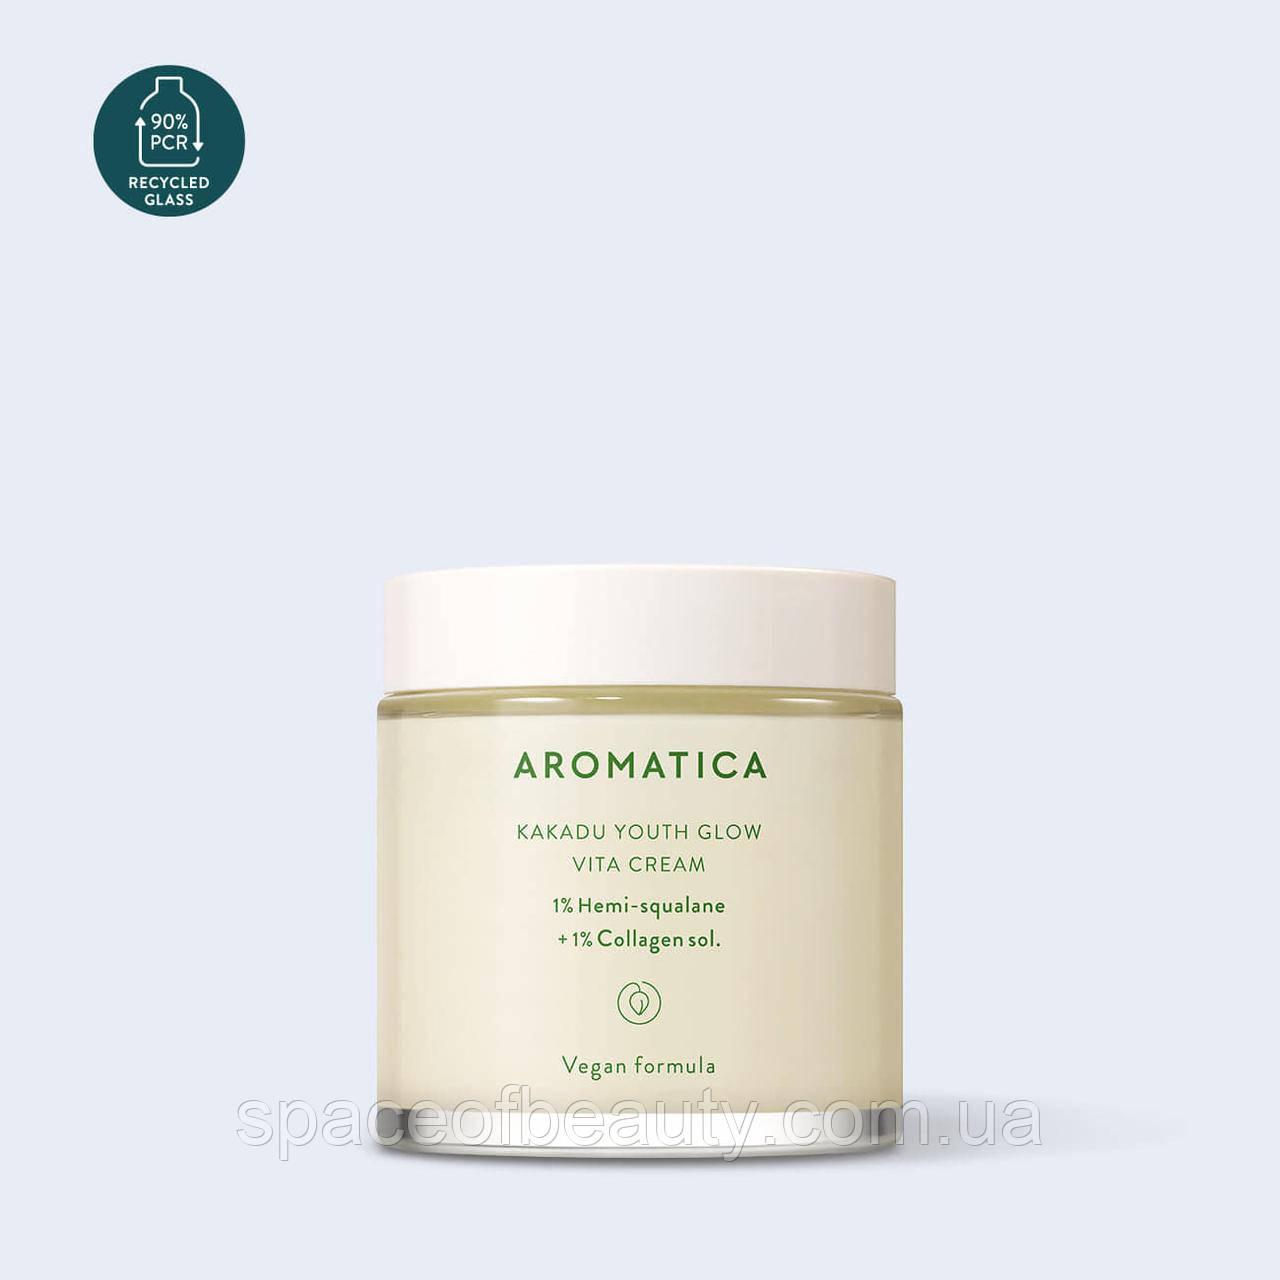 Крем ночной с гемискваланом 1% и коллагеном 1% Aromatica Kakadu Youth Glow Vita Cream 100 ml